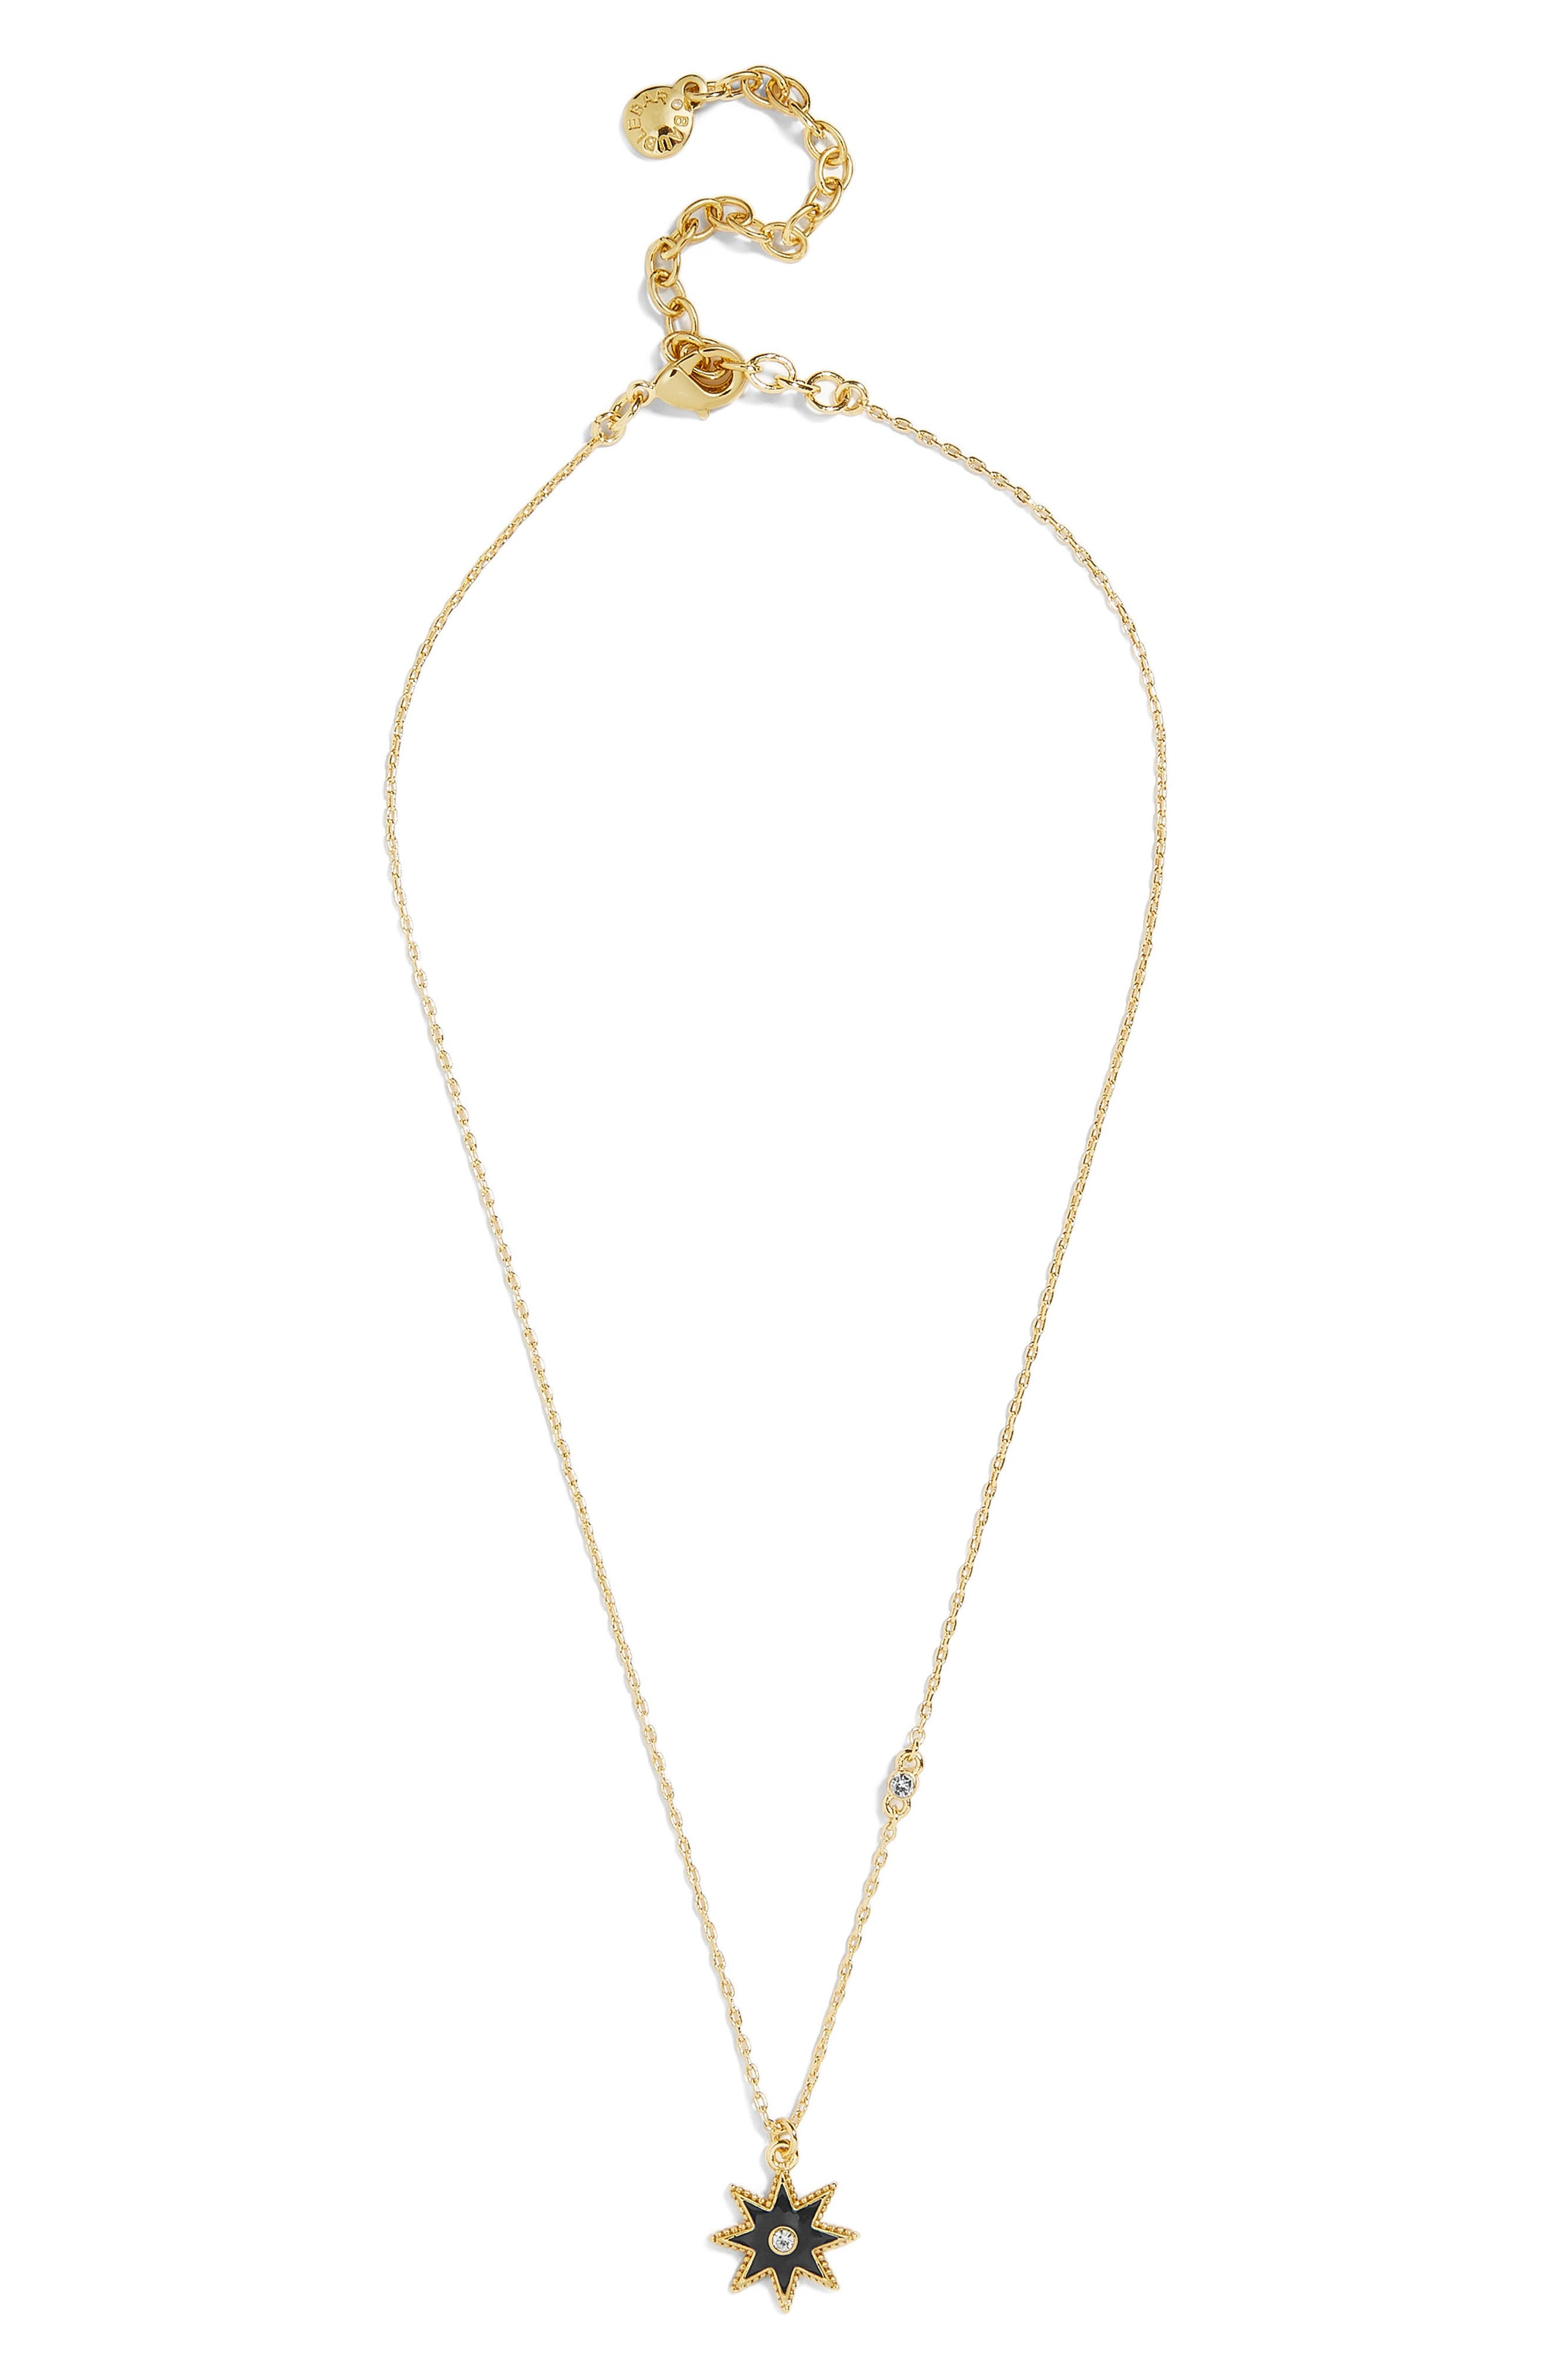 Merralina Star Pendant Necklace,                             Main thumbnail 1, color,                             GOLD/ BLACK